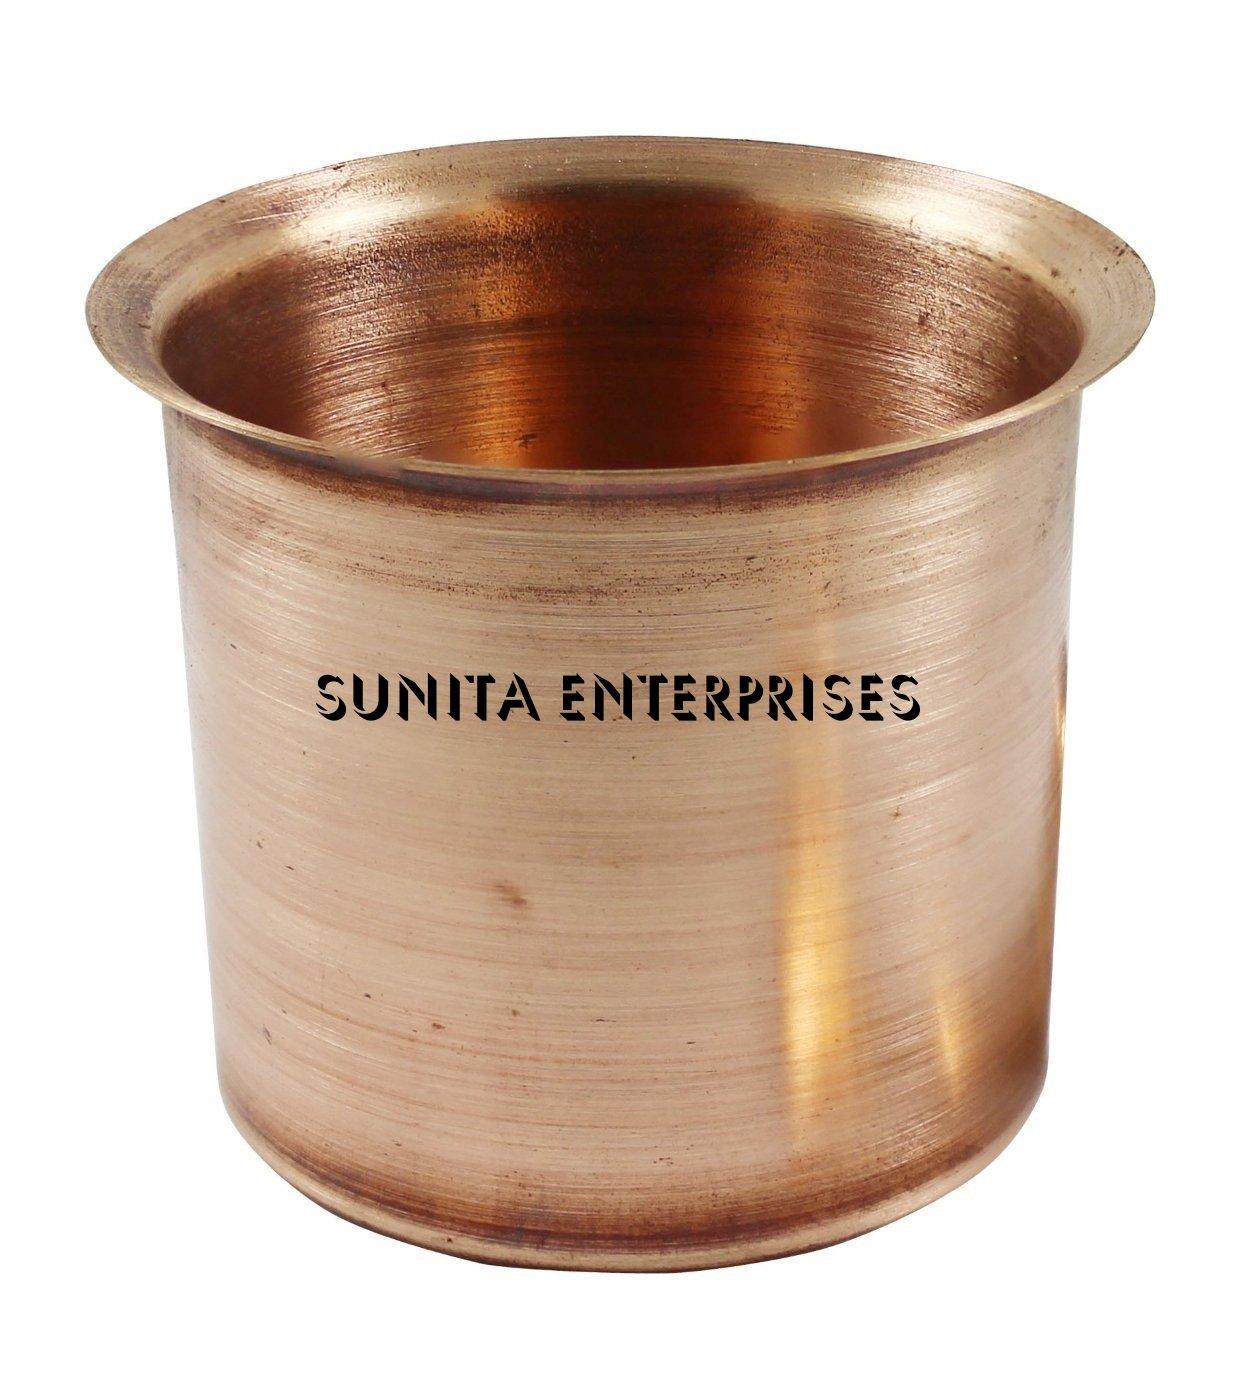 SUNITA ENTERPRISES Present INDIAN Ayurvedic Pure Copper Tulsi Water Drinking Glass - Tumbler, Puja - Pooja Copper Mug-Cup-Loti, Serveware,Tableware & Drinkware 150+ ML Capacity (5 US Fluid Ounce)